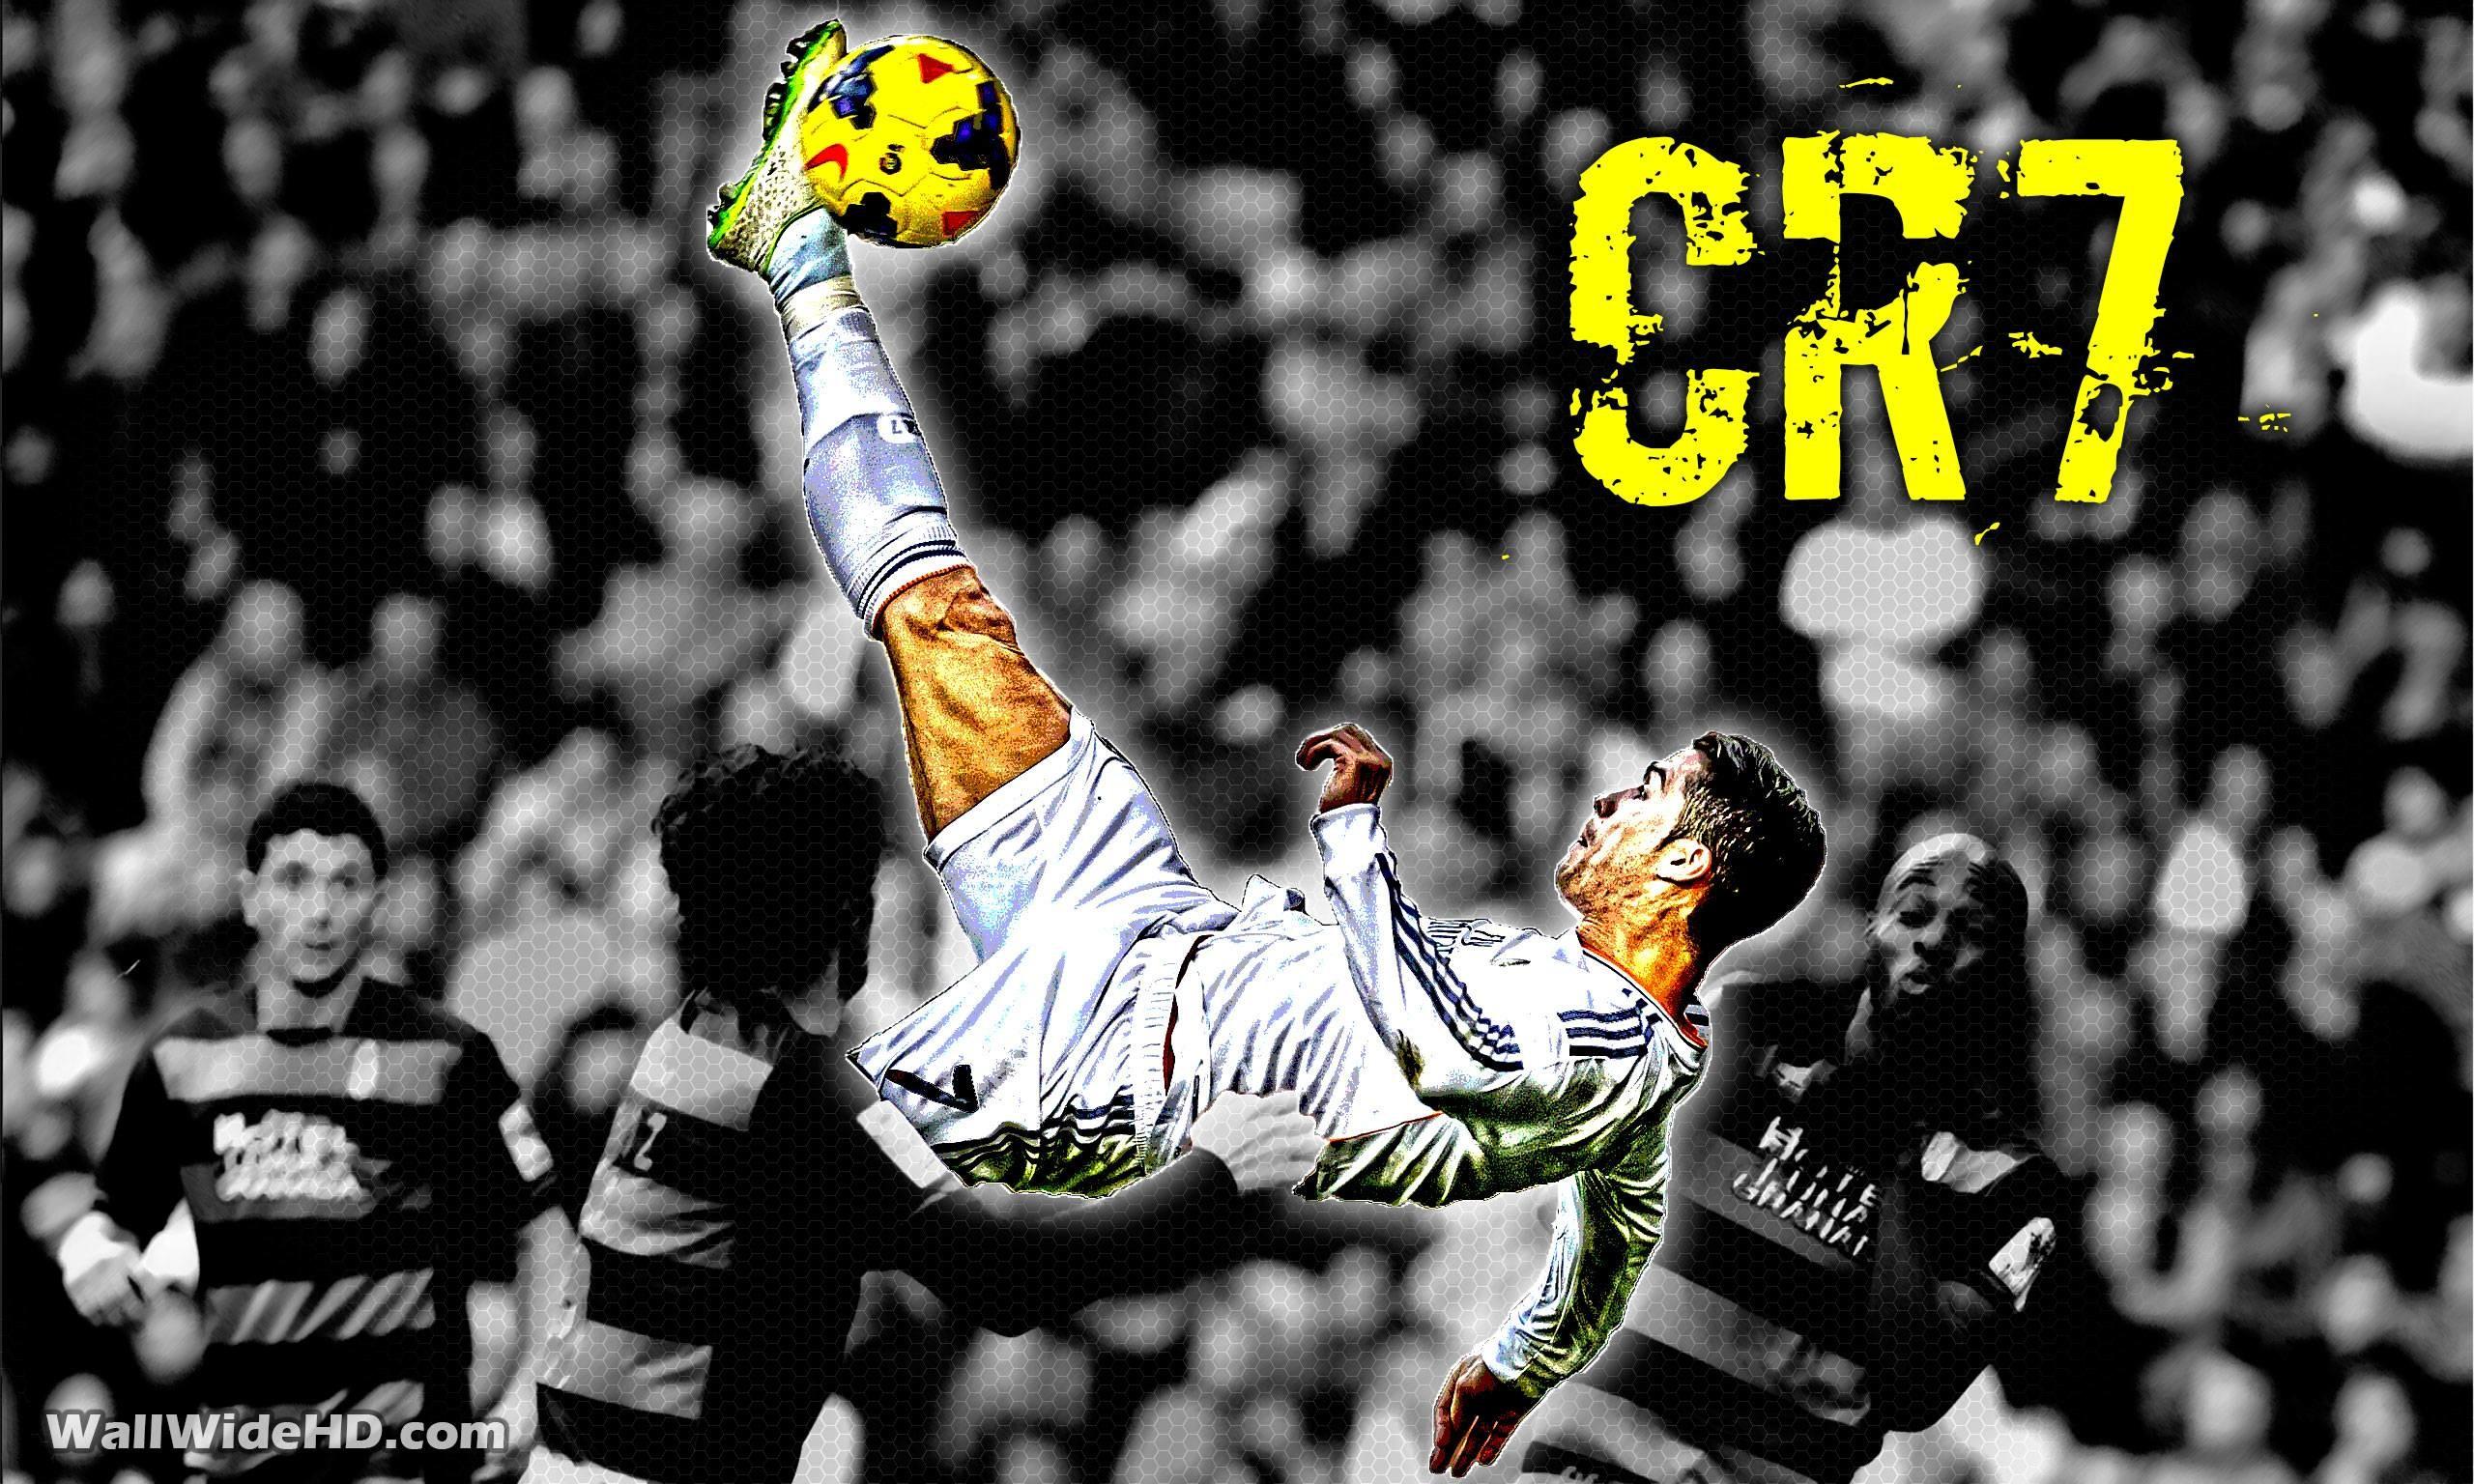 tải ảnh Cristiano Ronaldo full HD